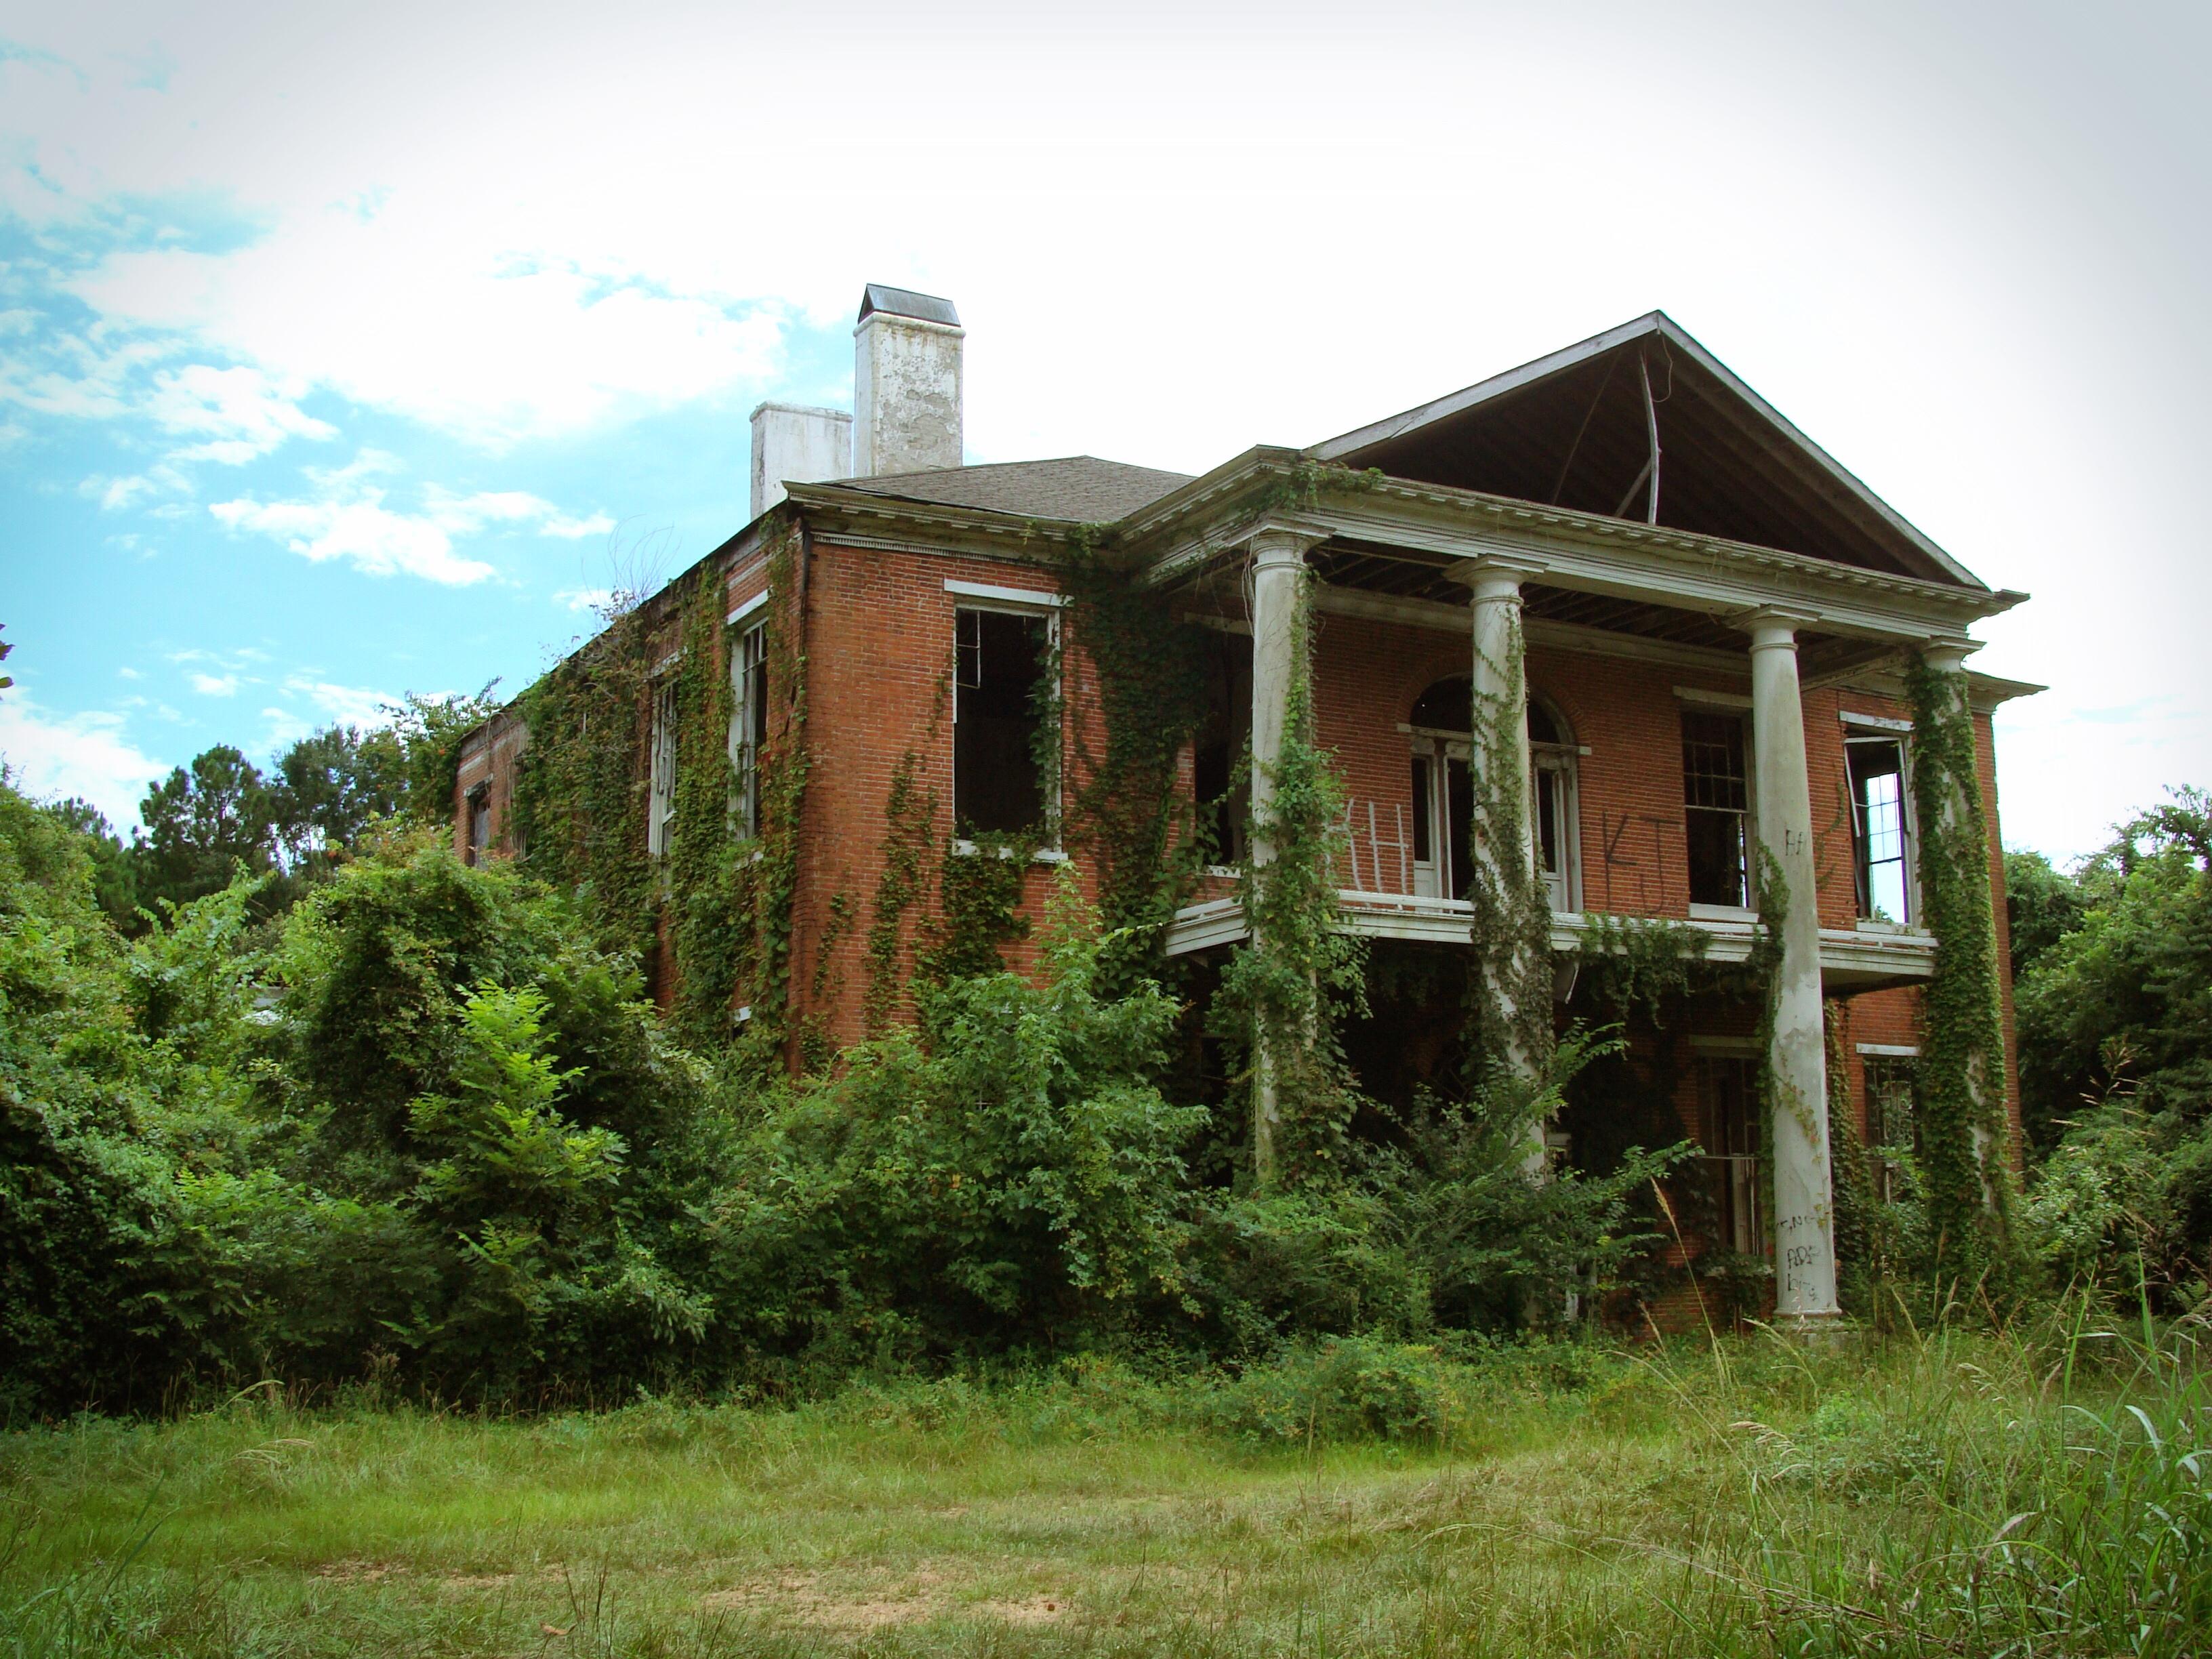 Arlington Natchez, Mississippi